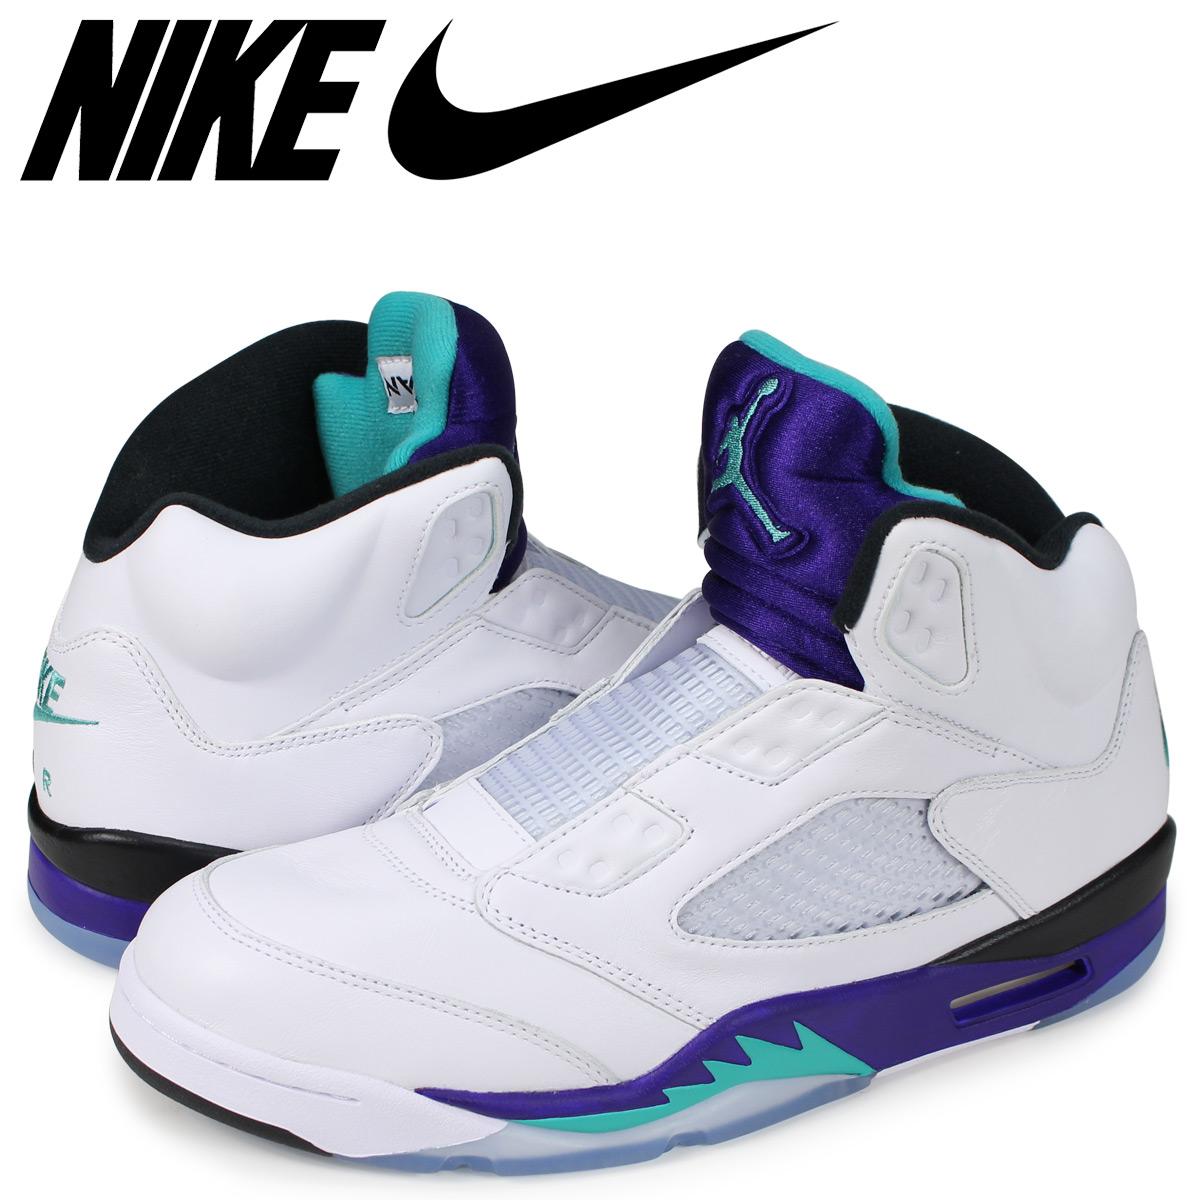 super popular 1297c d7efe [brand NIKE getting high popularity from sneakers freak].